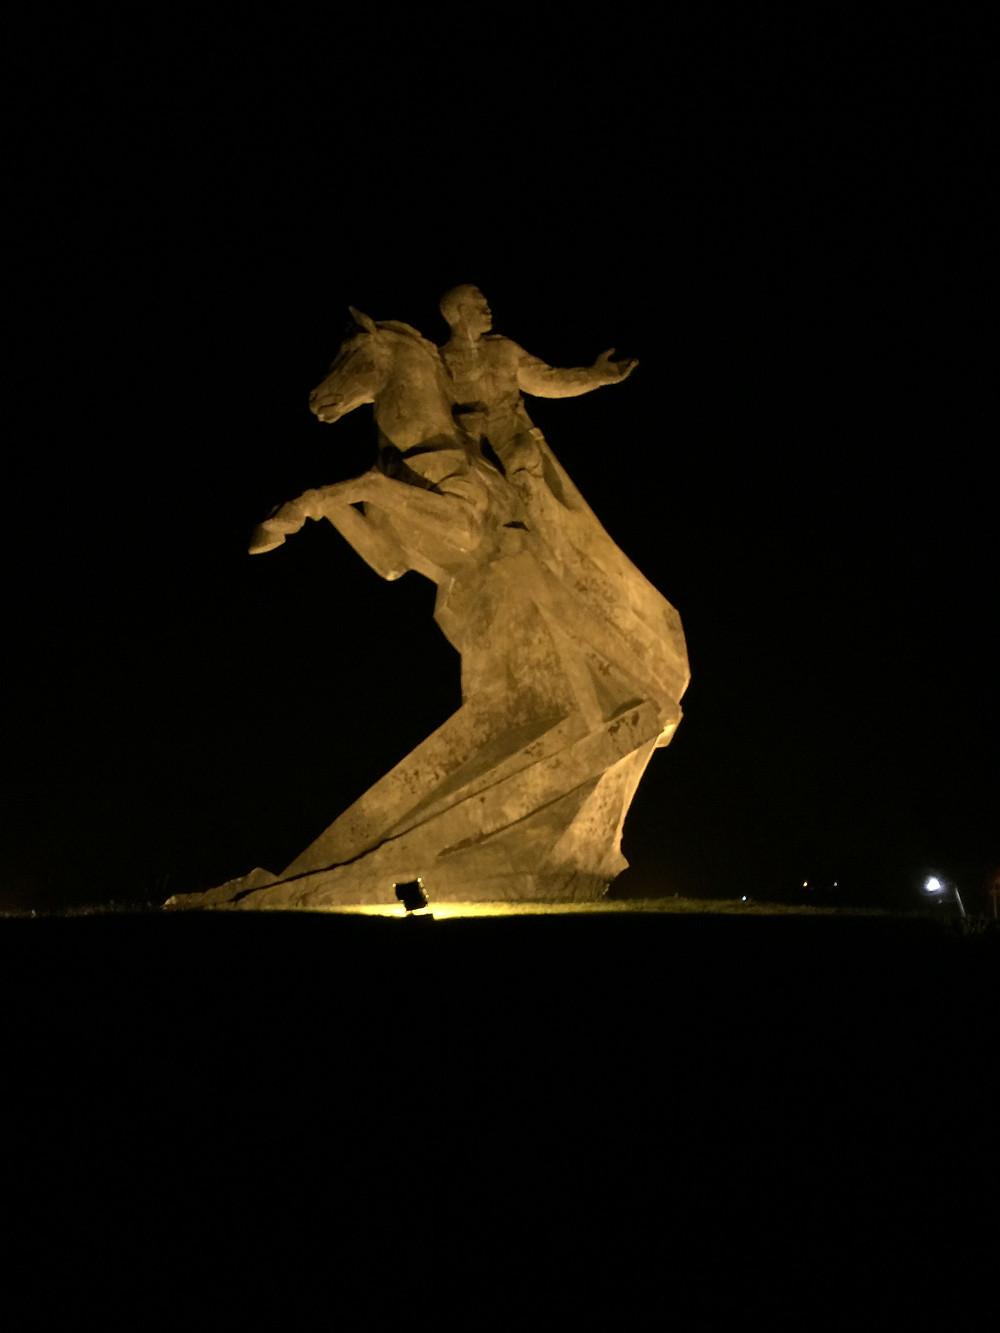 A Beautiful Sculpture with Beautiful Lighting